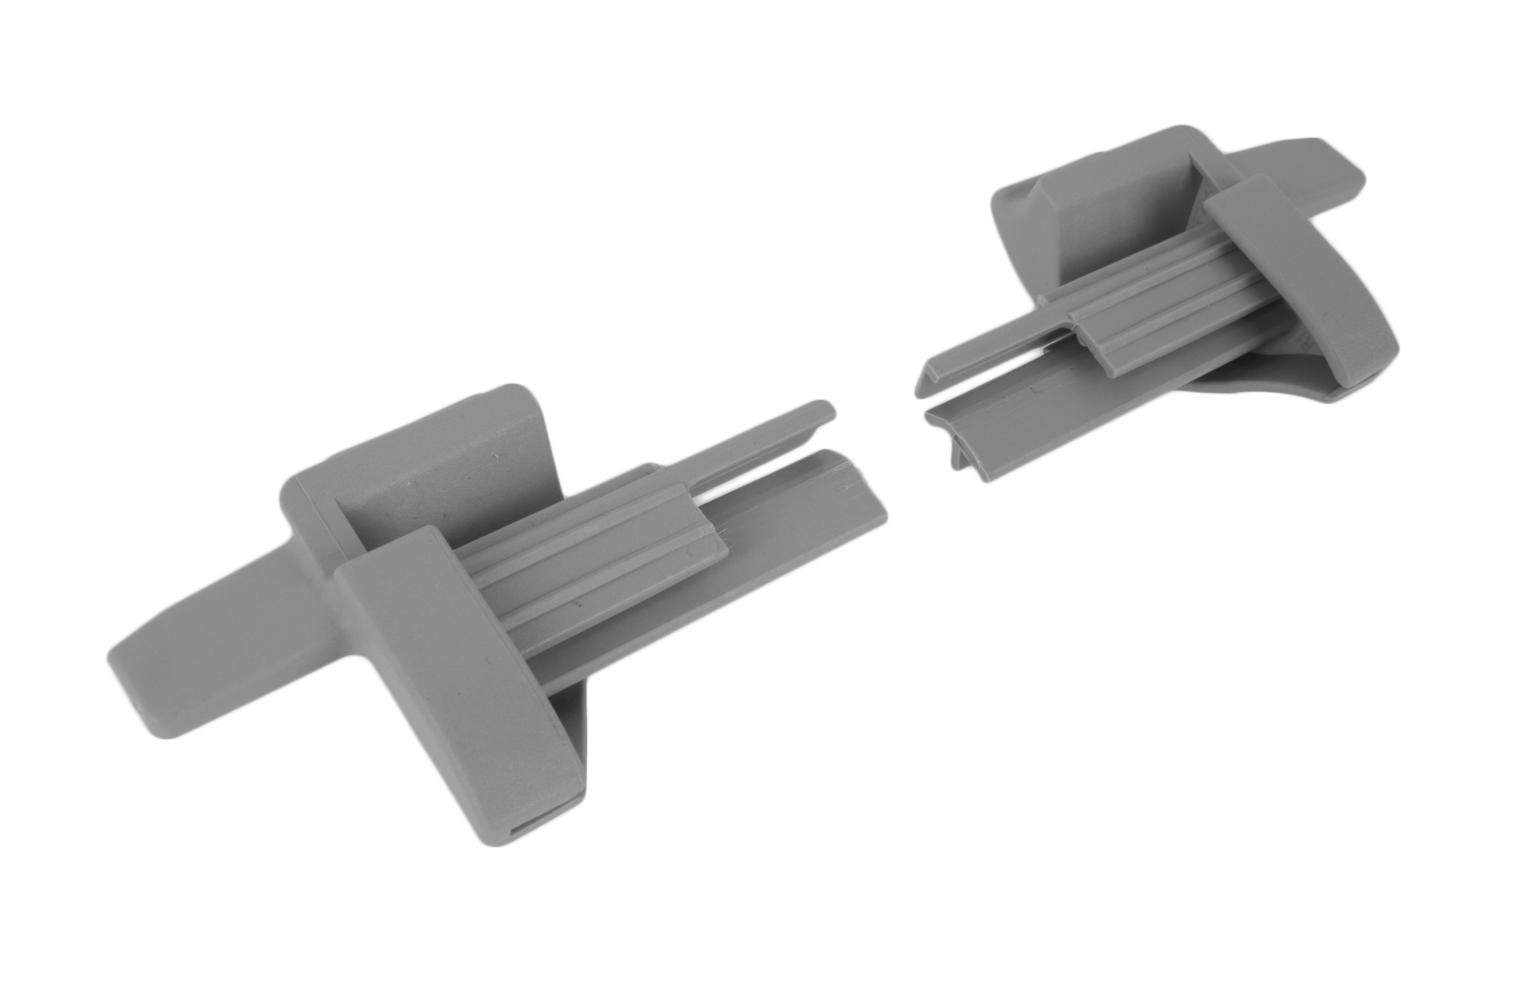 слайдер жалюзи mercedes a-klasa w169 w245 - серый